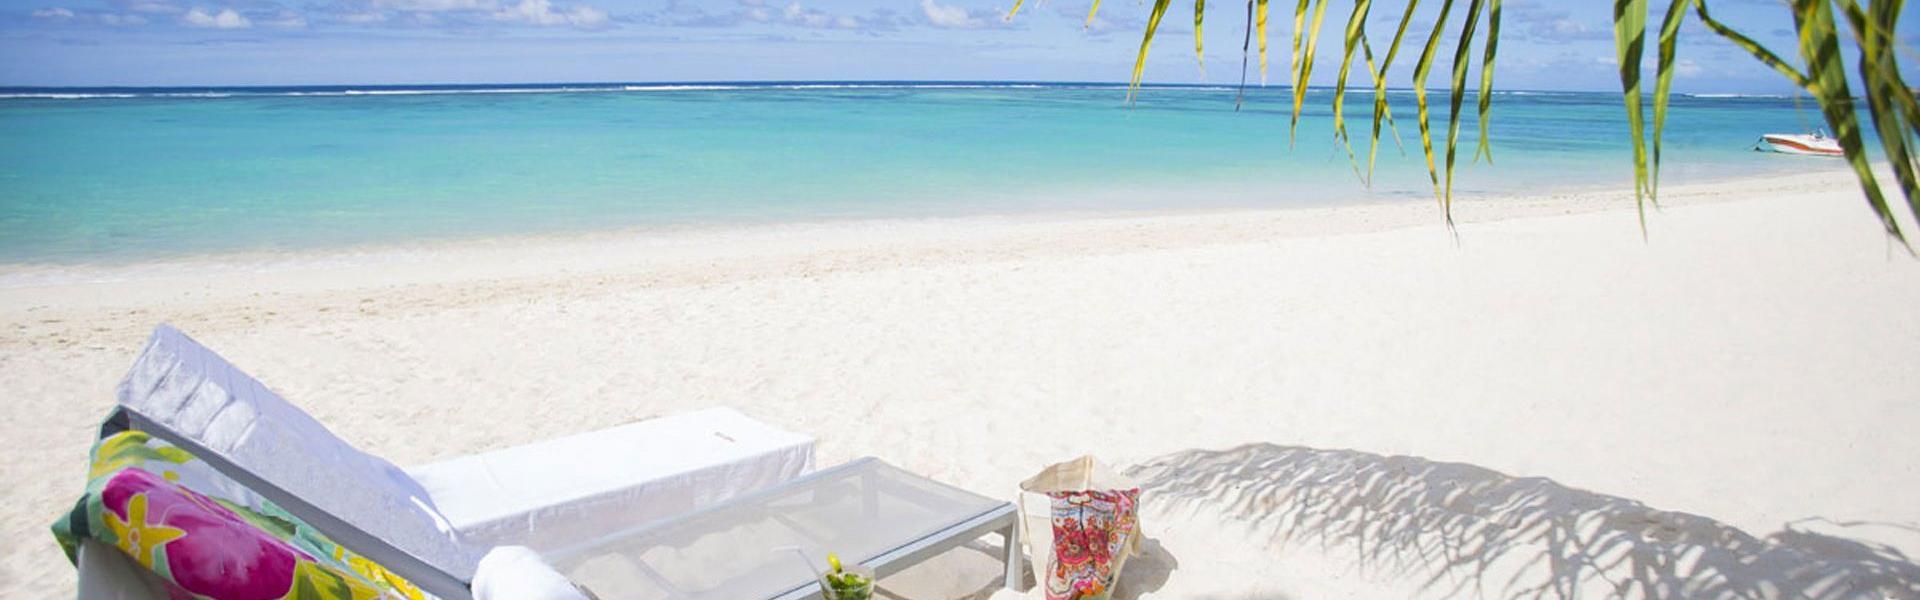 Maritim Crystals Beach Hotel (Mauritiusi utazások)